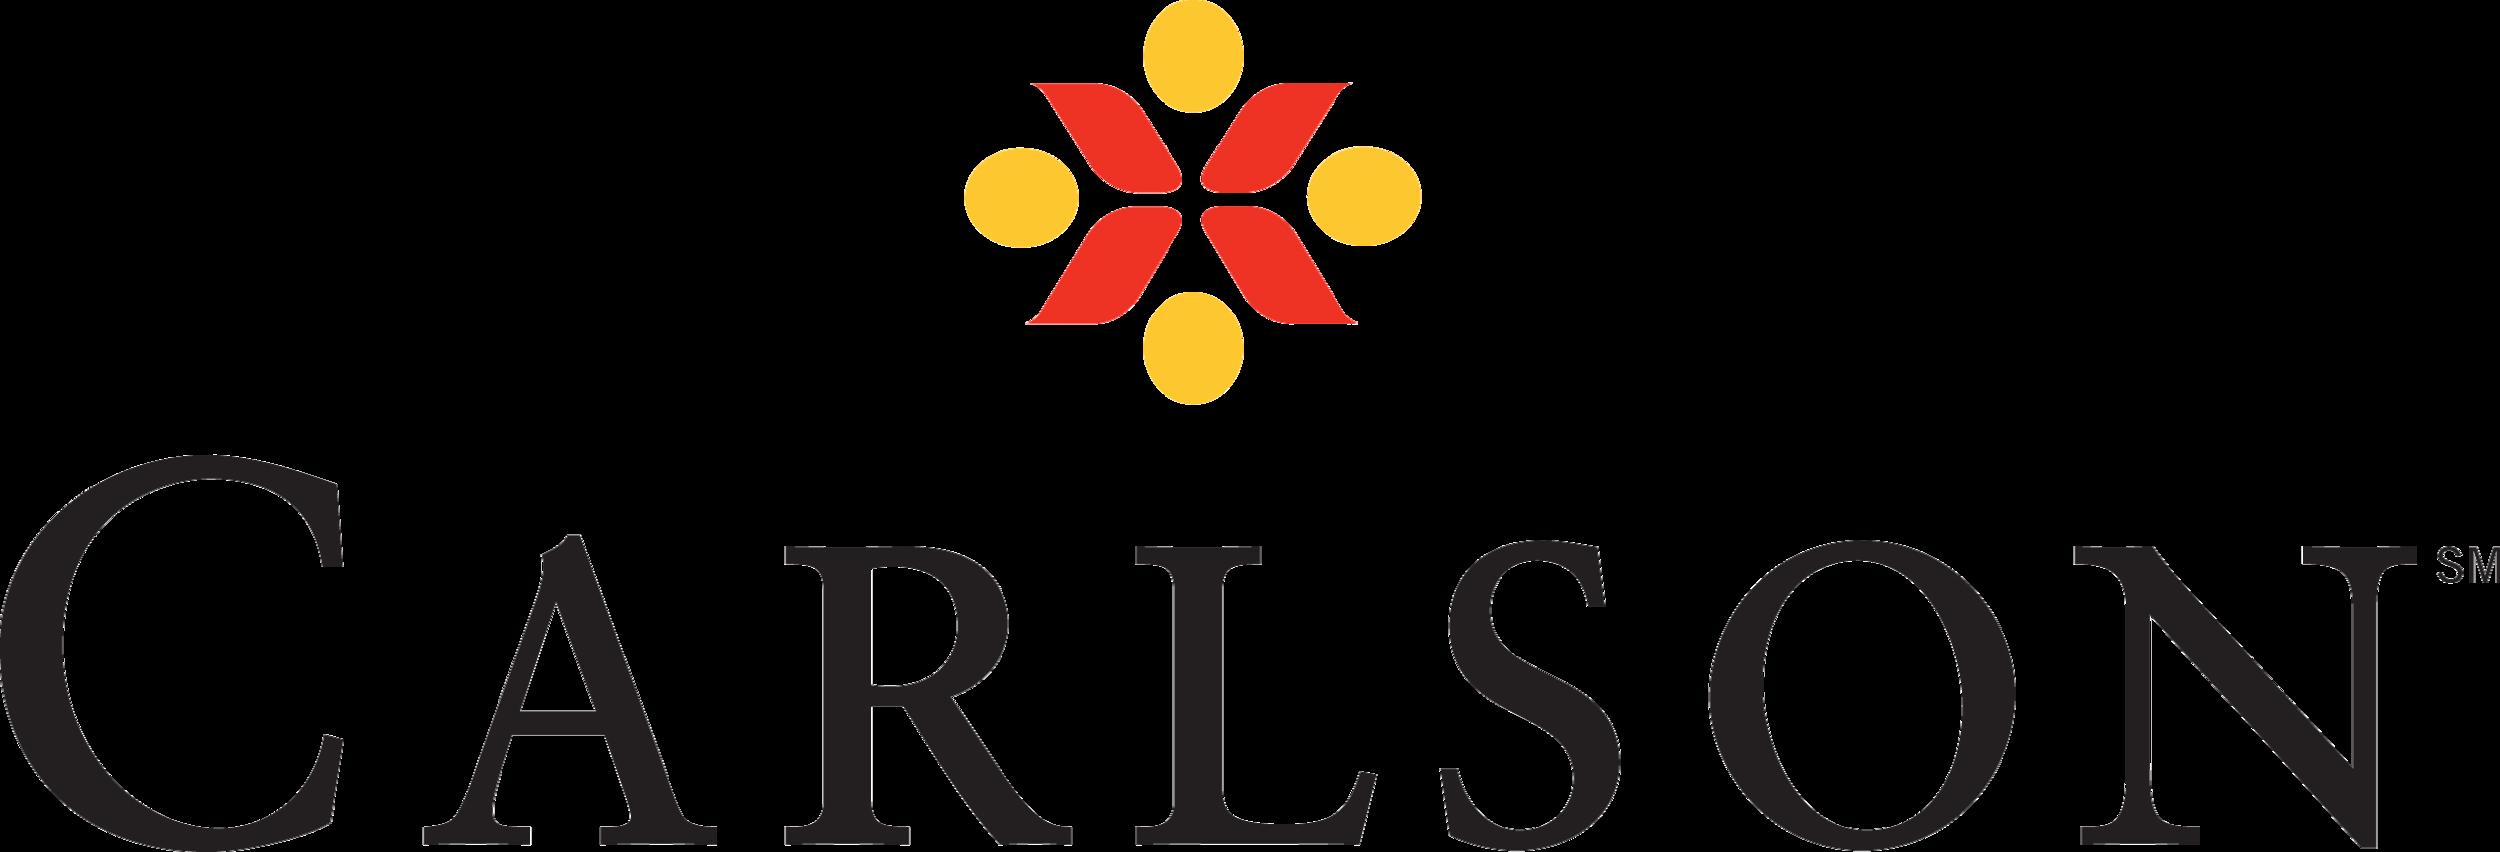 CARLSON_logo.png